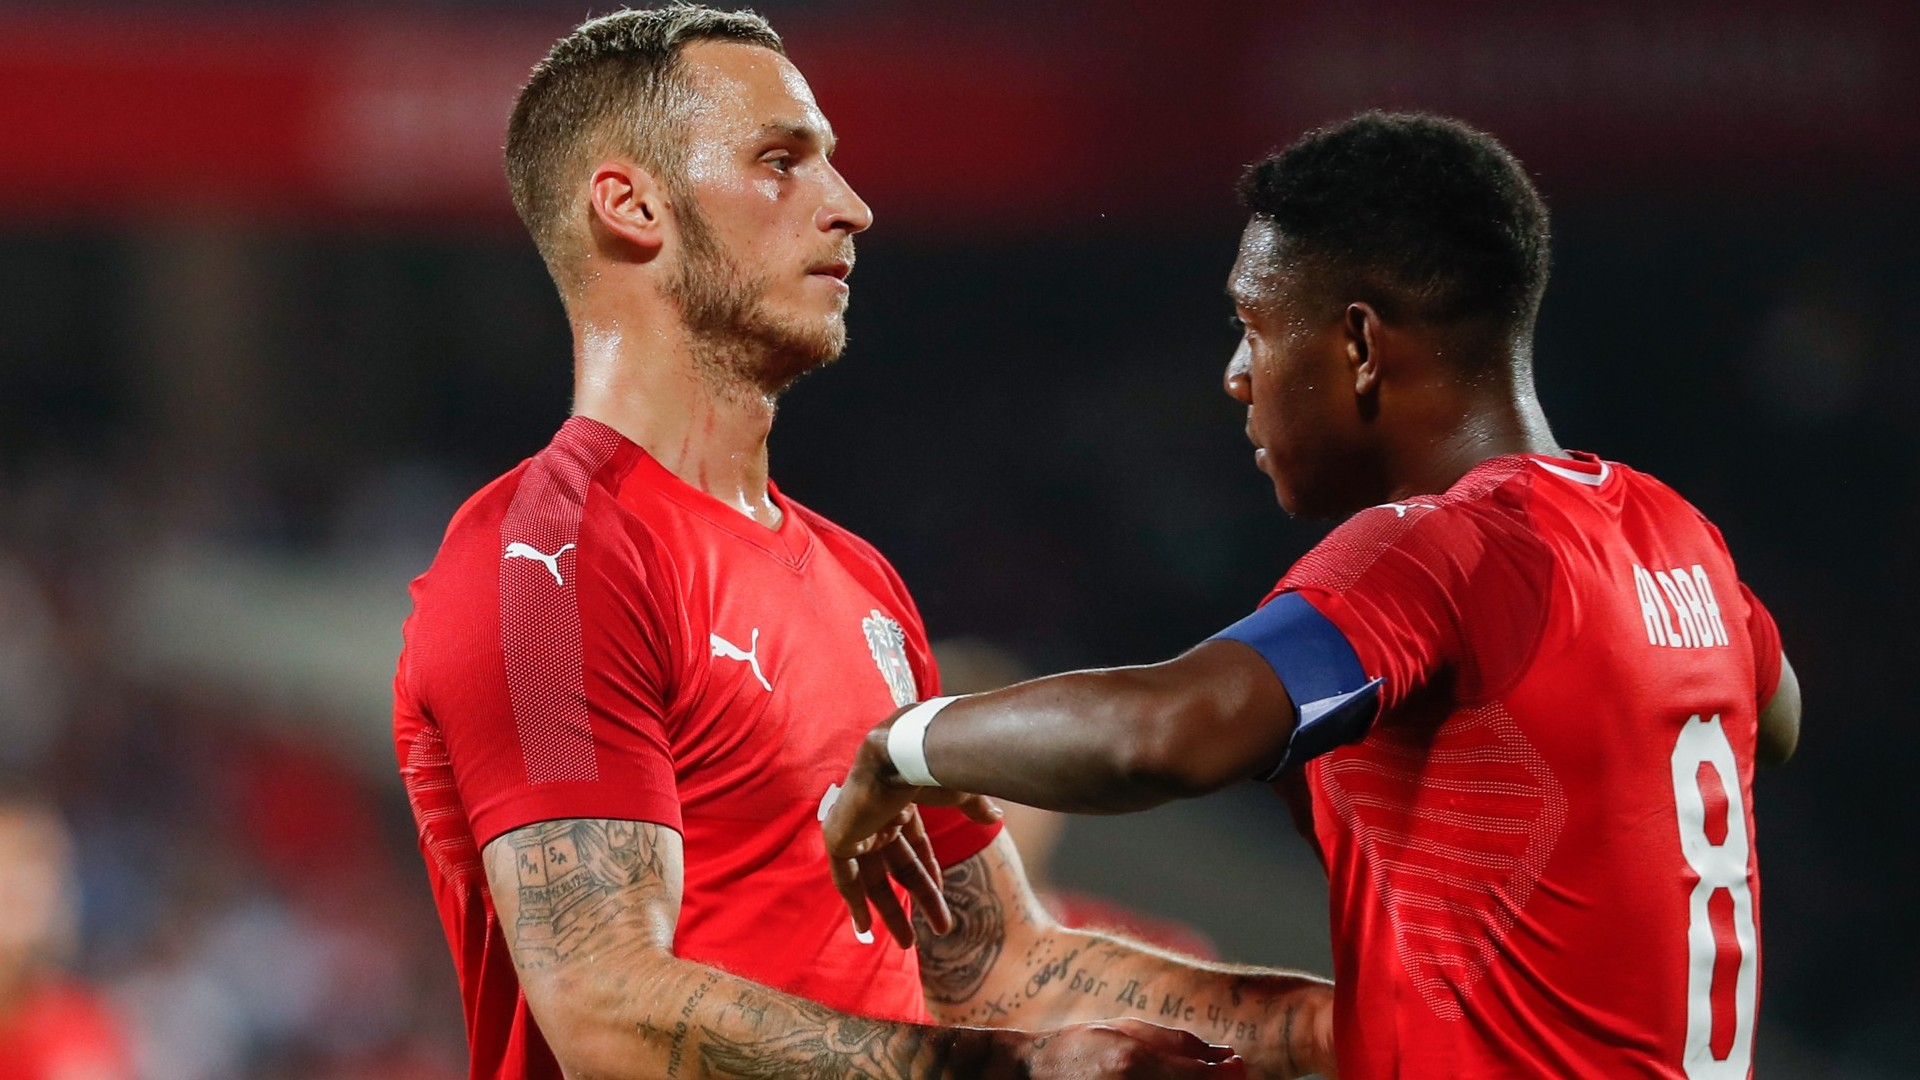 Marko Arnautovic and David Alaba will shoulder Austria's hopes in the tournamenta